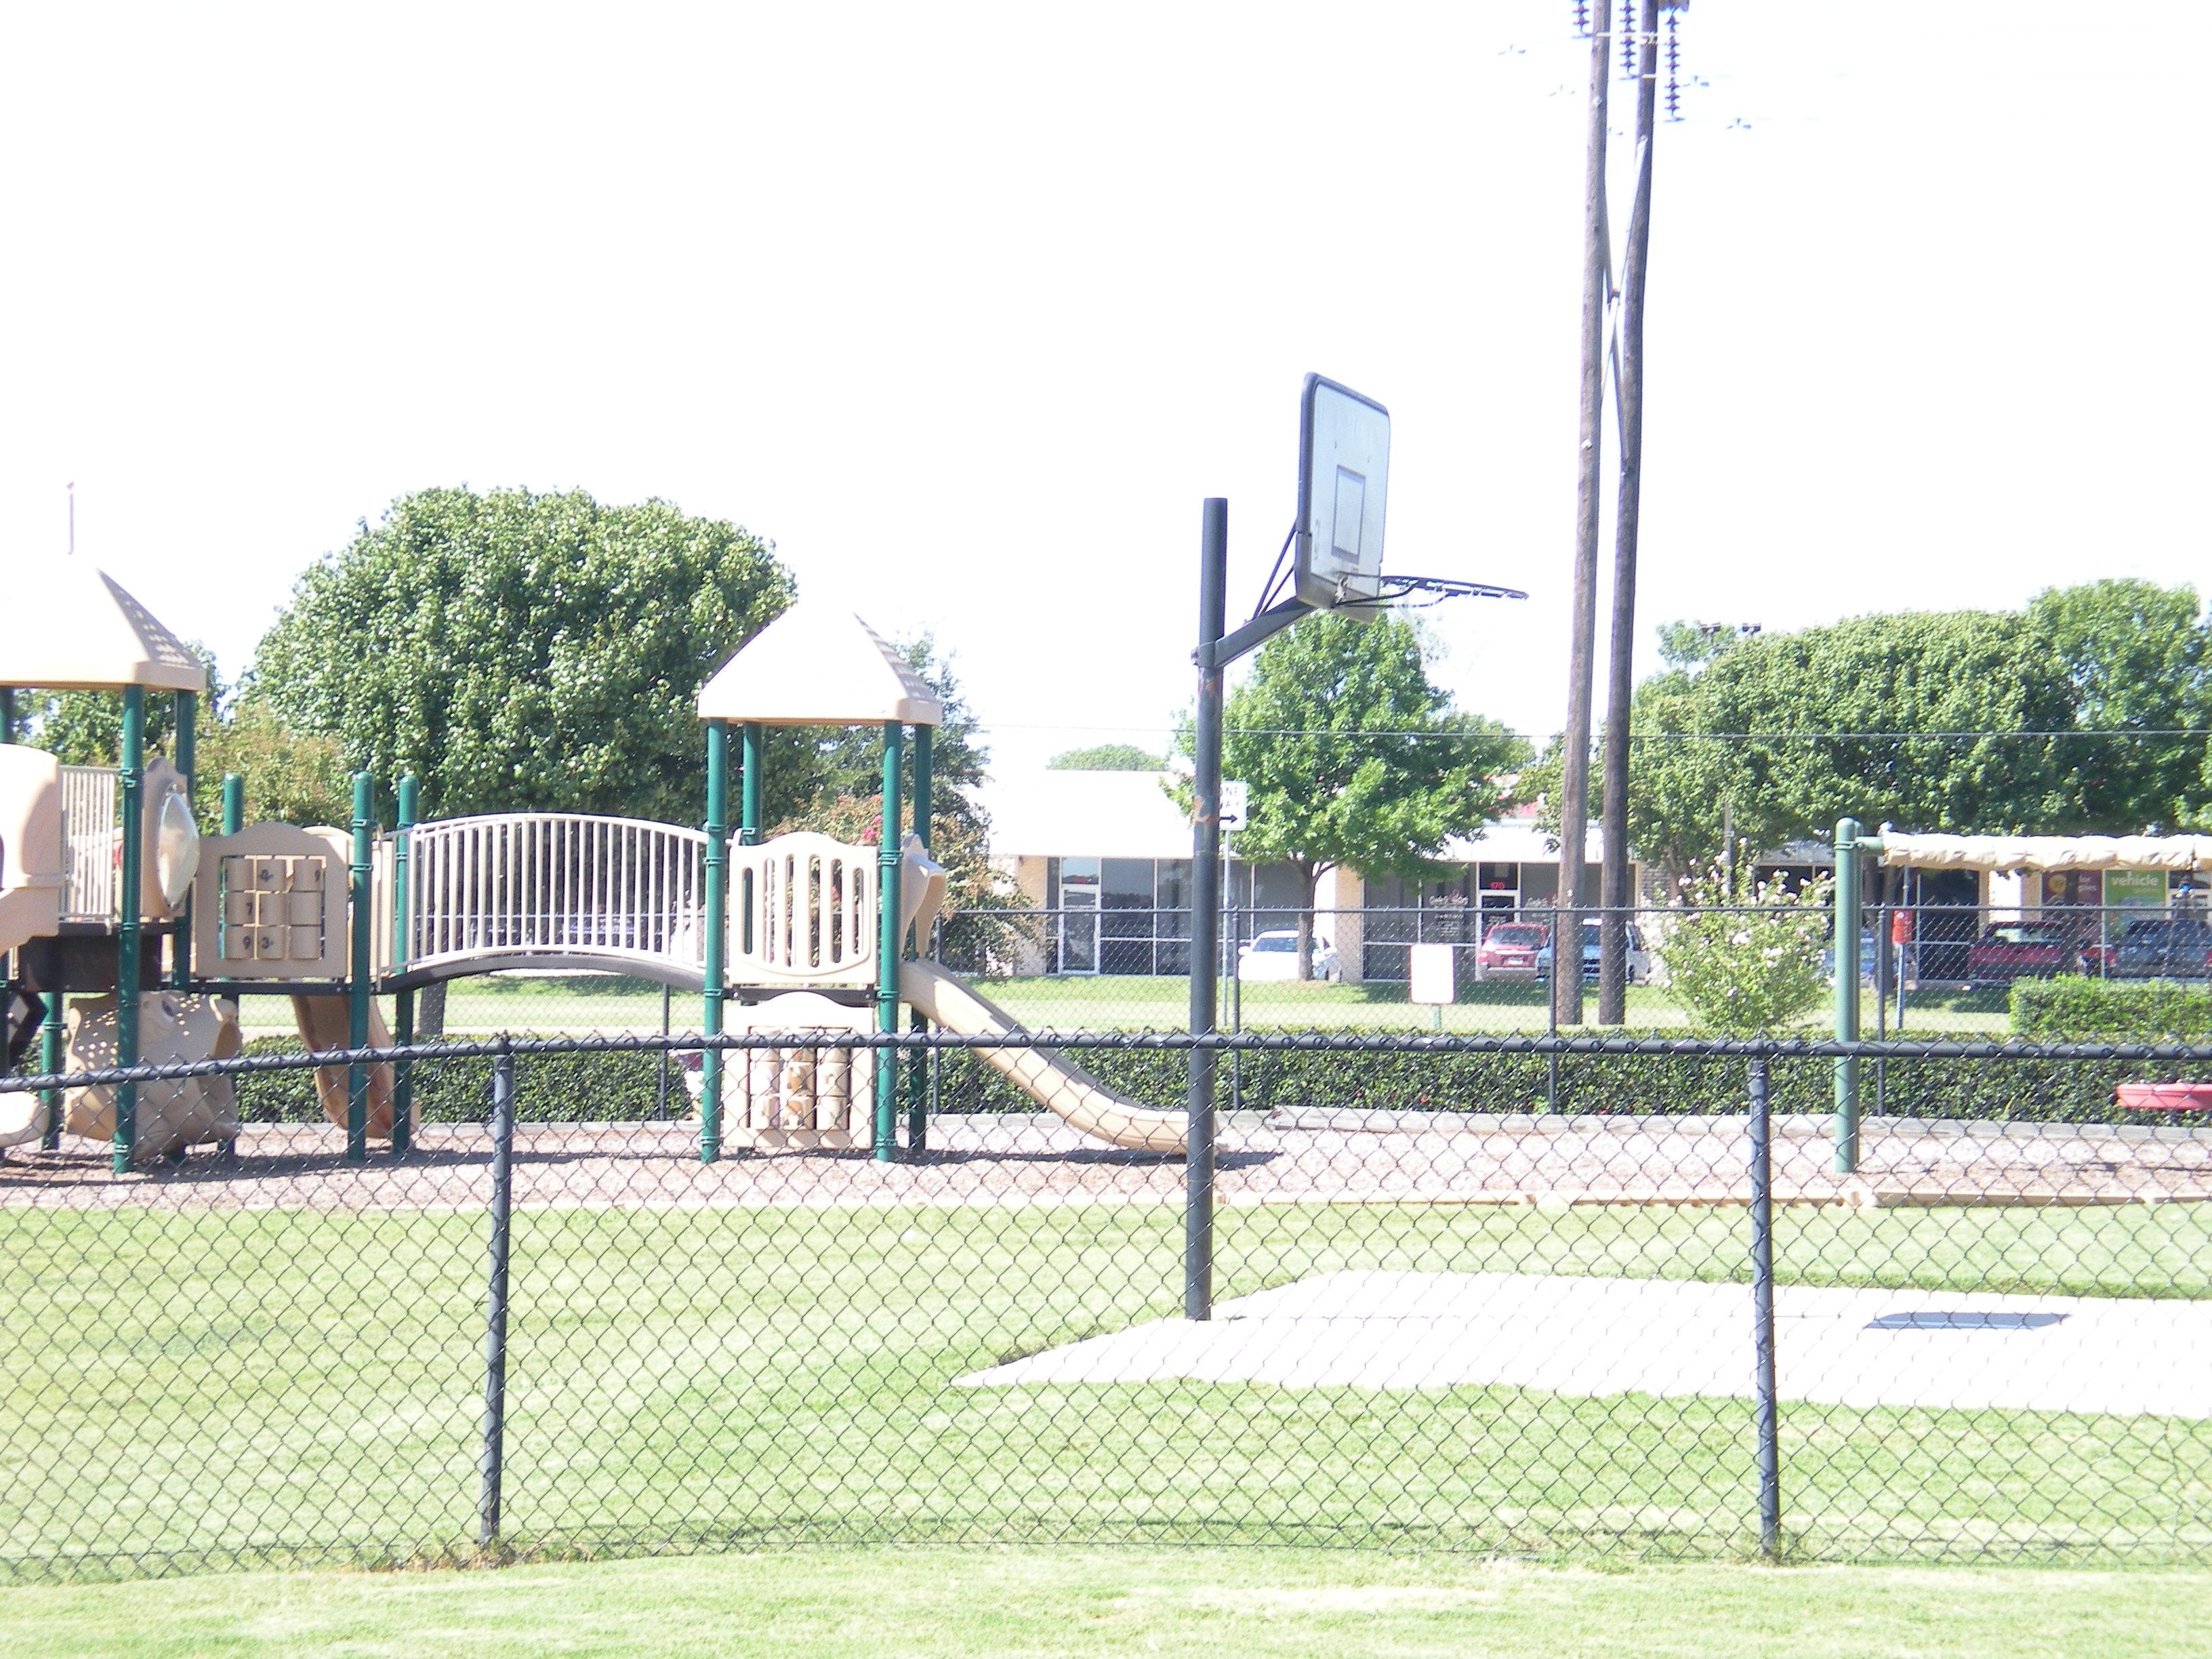 Primrose School of North Lewisville image 5